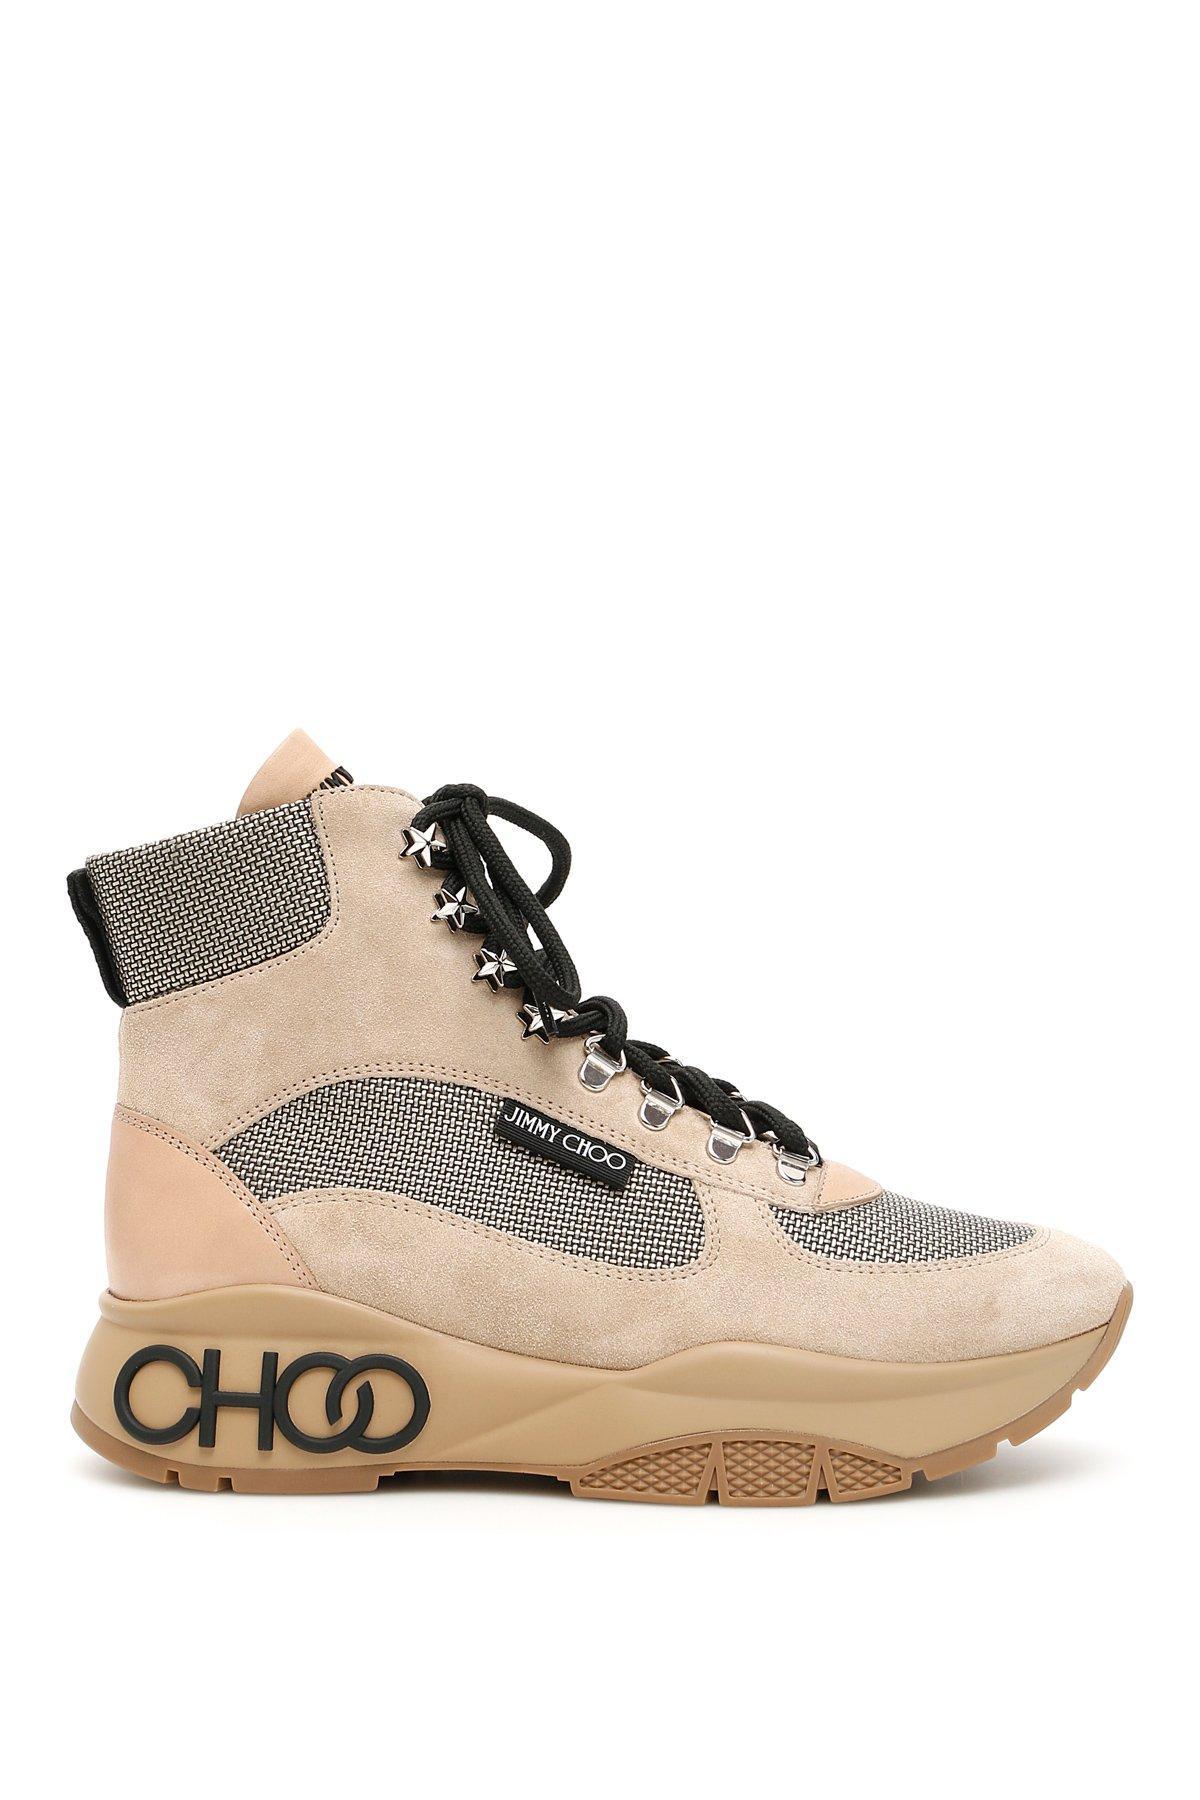 Jimmy Choo Inca Suede Hiking Boots